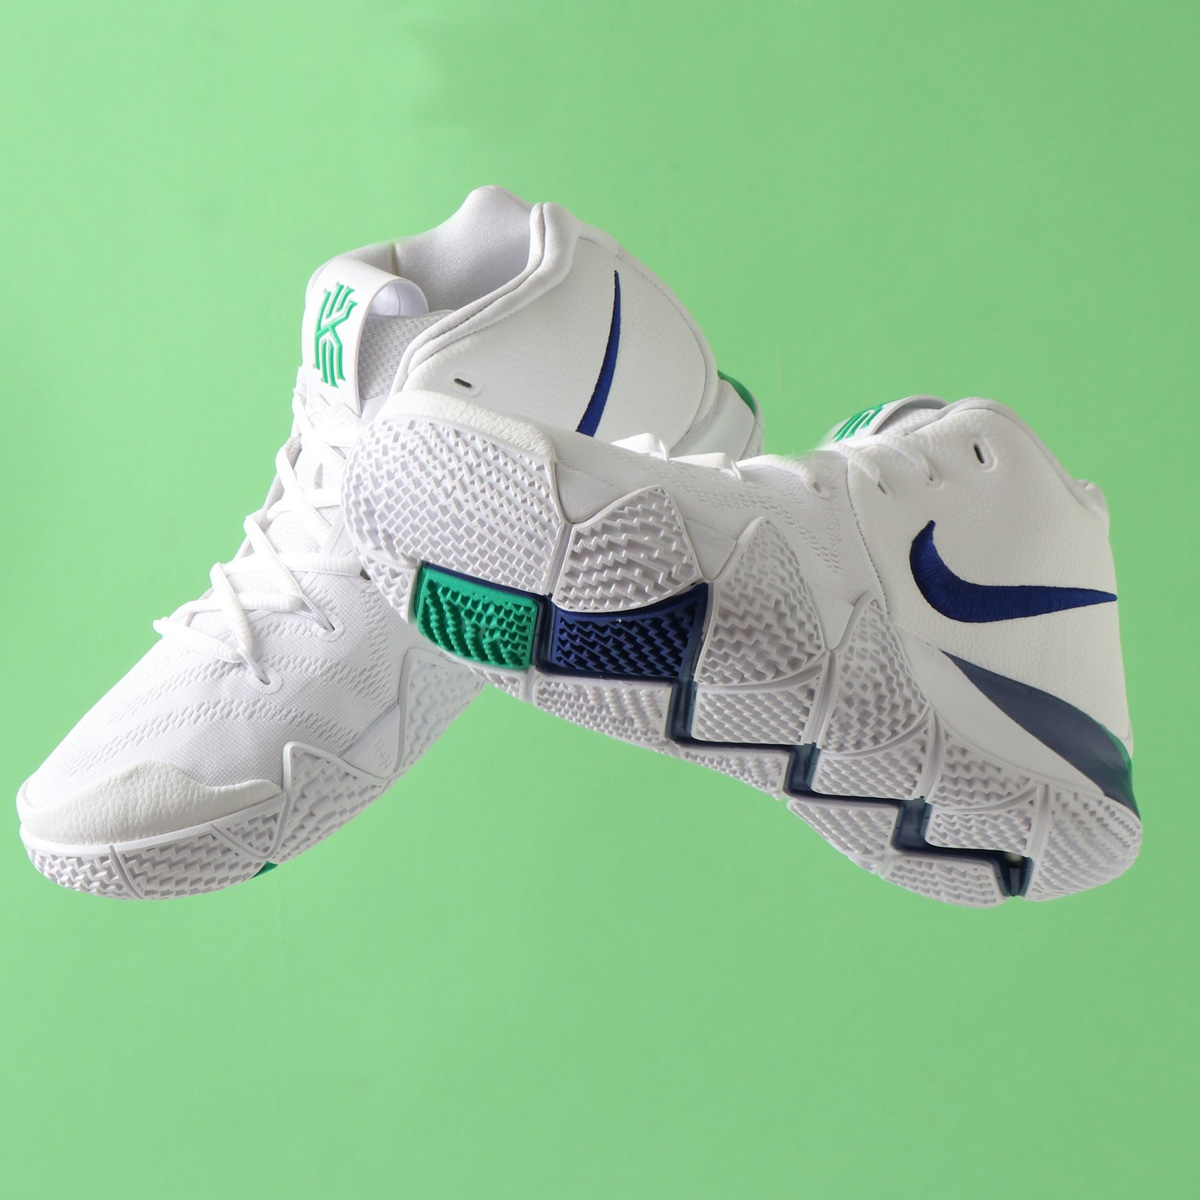 size 40 b40f6 c22c5 NIKE KYRIE 4 EP (Nike chi Lee 4 EP) WHITE DEEP ROYAL BLUE 18SU-S